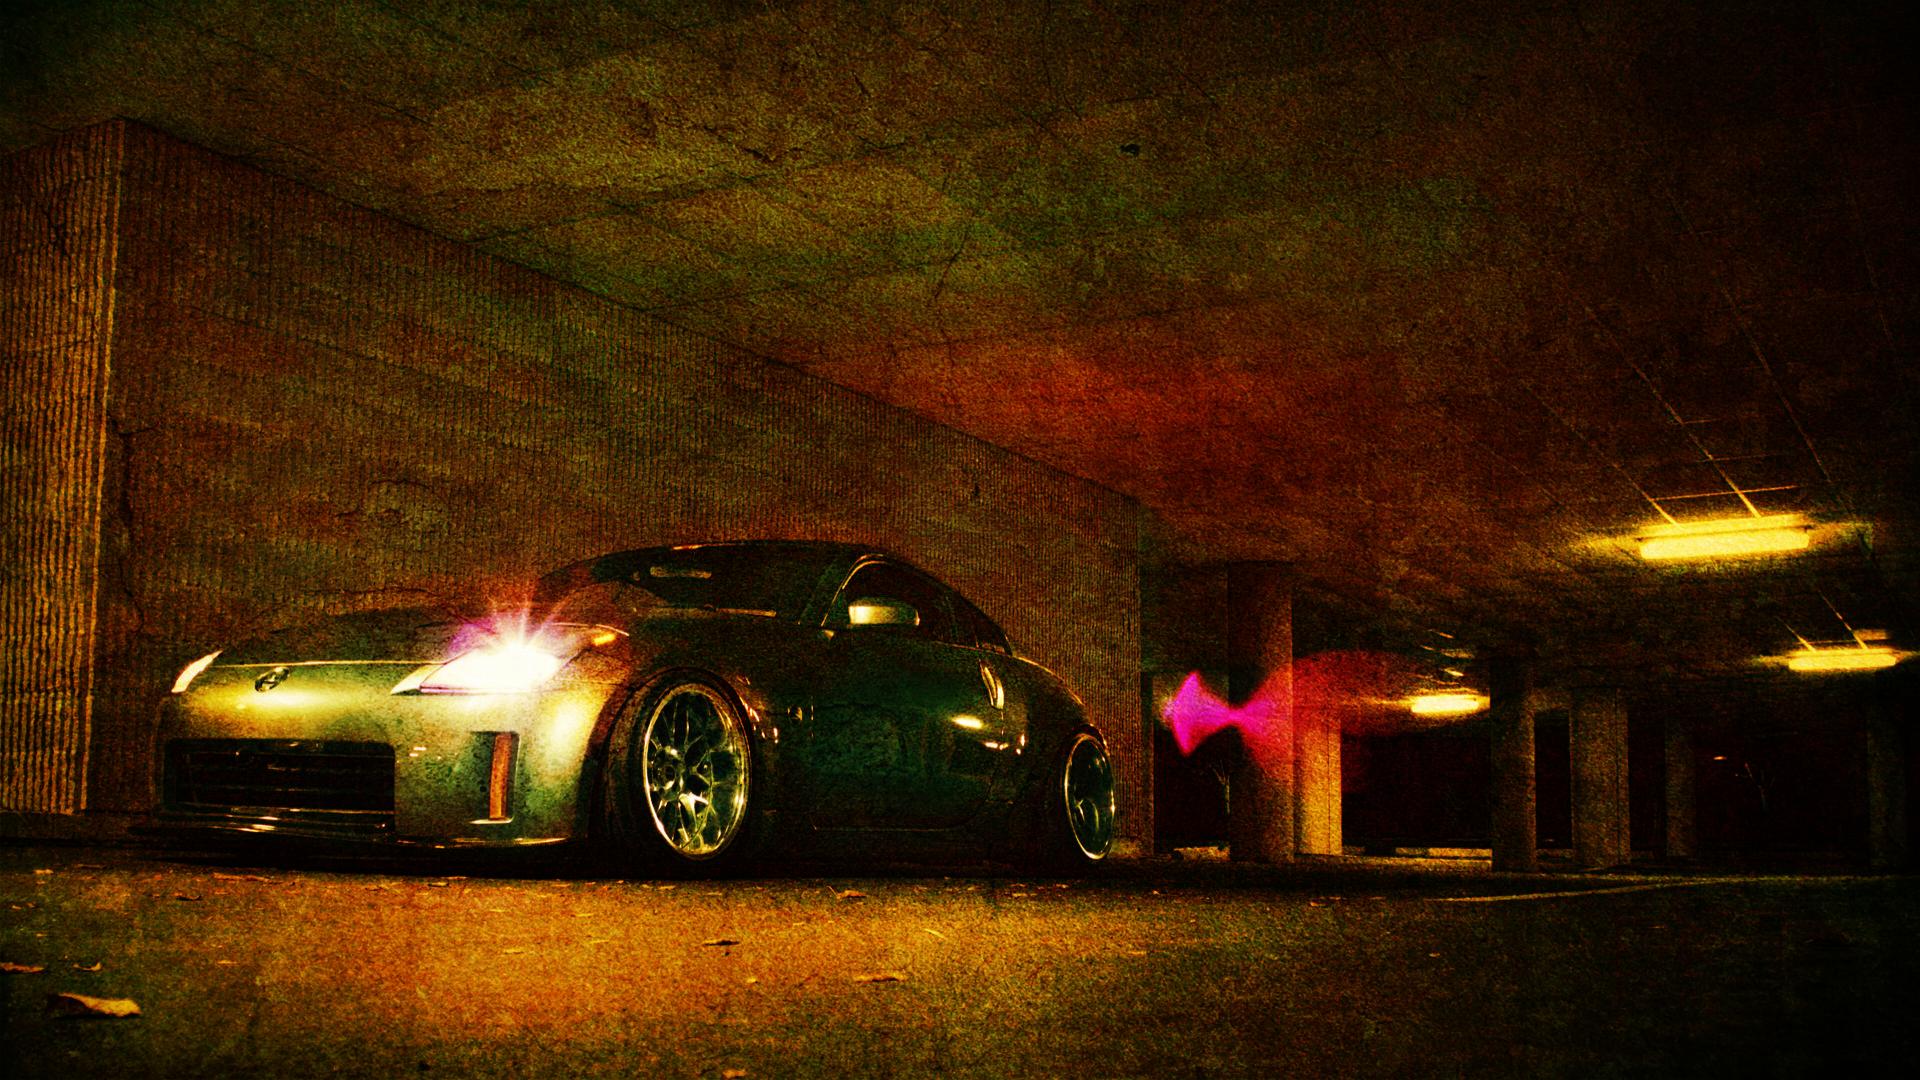 Araçlar - Modifiye Nissan Tuning Parking Lot Underground Noise Duvarkağıdı - Parking Lot PNG HD